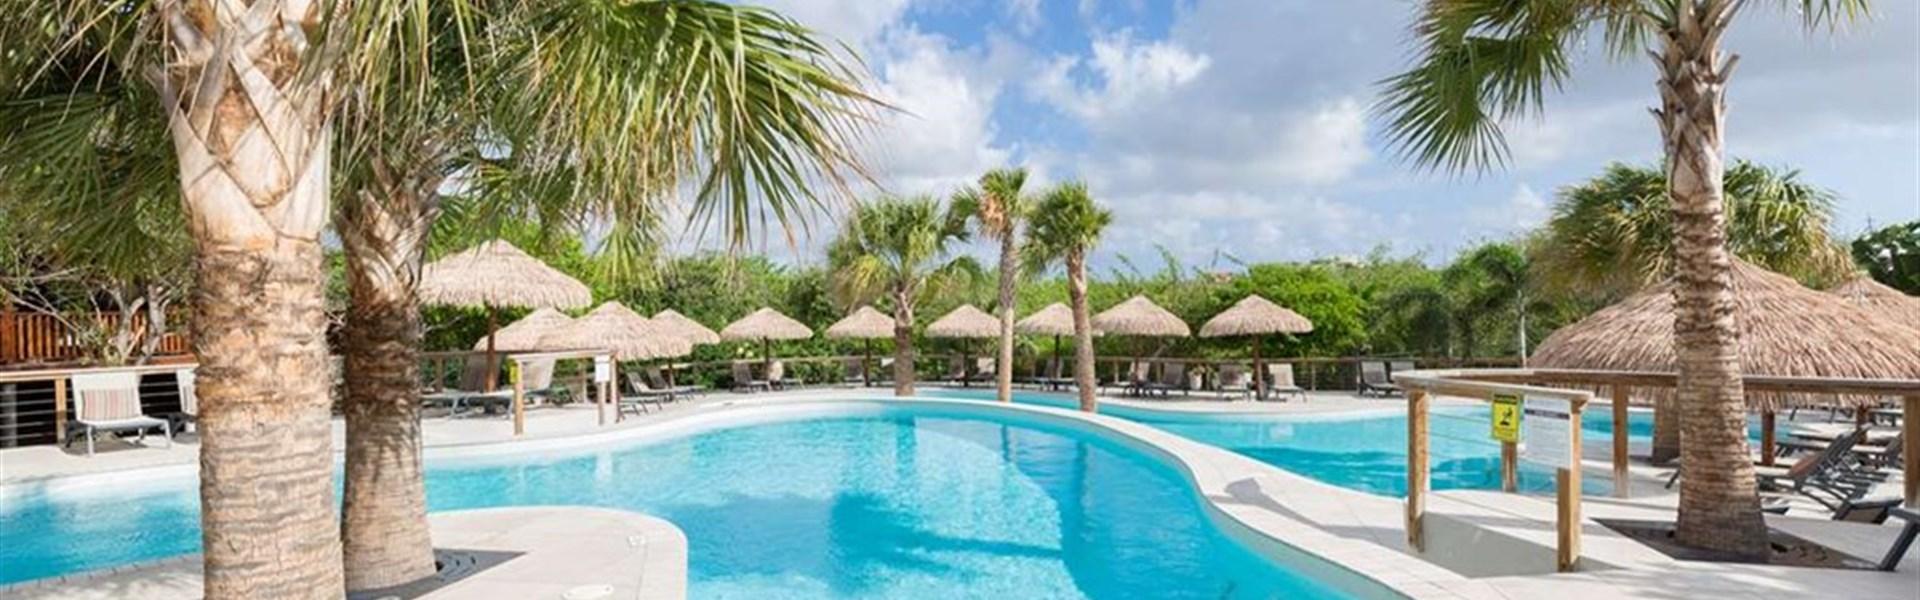 Morena Resort - Morena eco Resort, Curacao - dovolená s CK Marco Polo